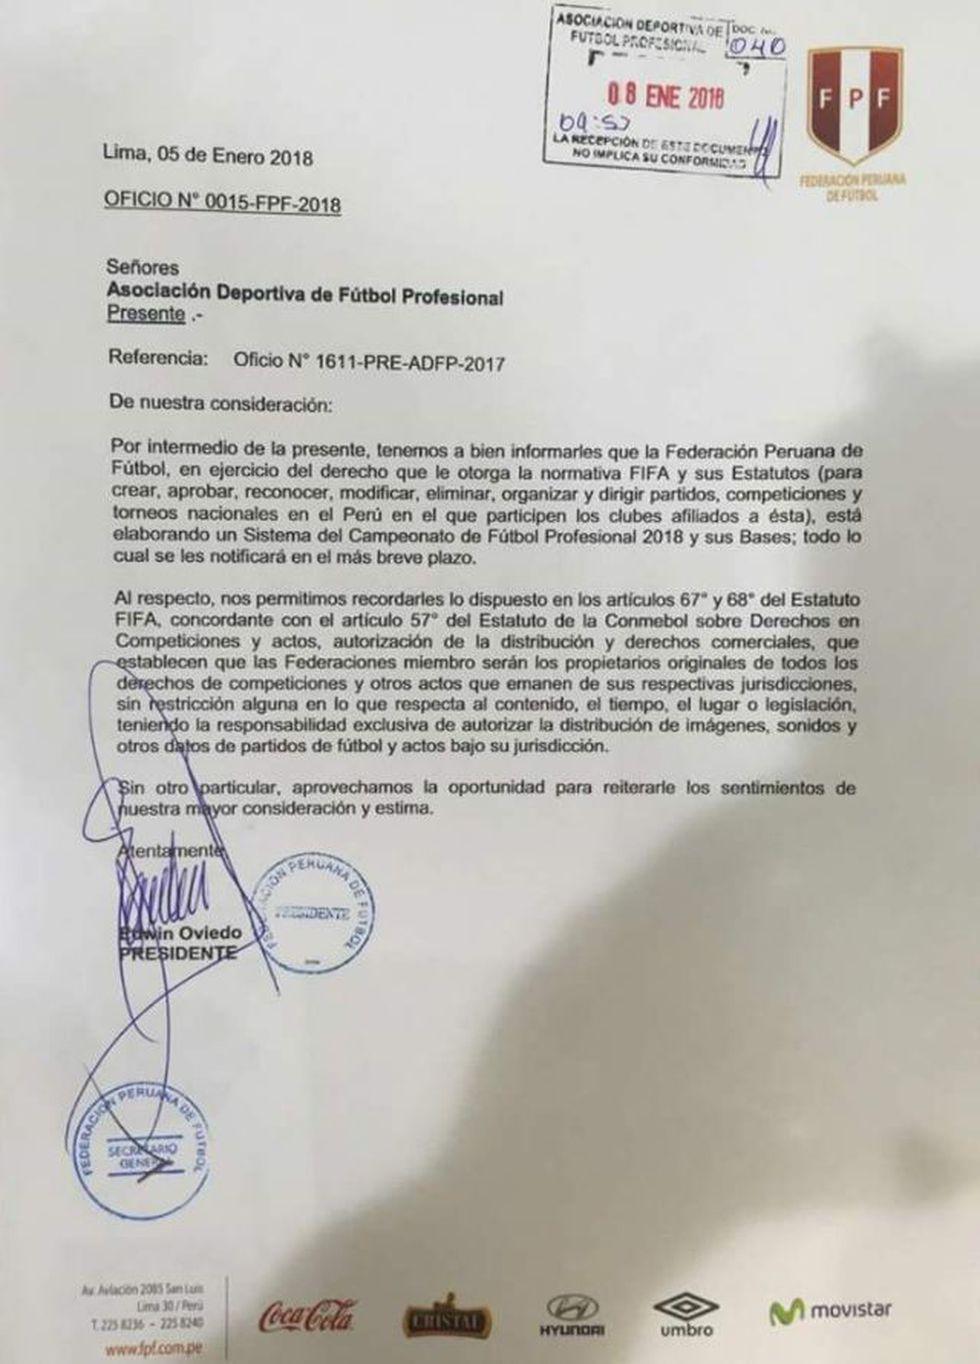 Oficio N° 0015-FPF-2018 (Twitter @nacionalperu)